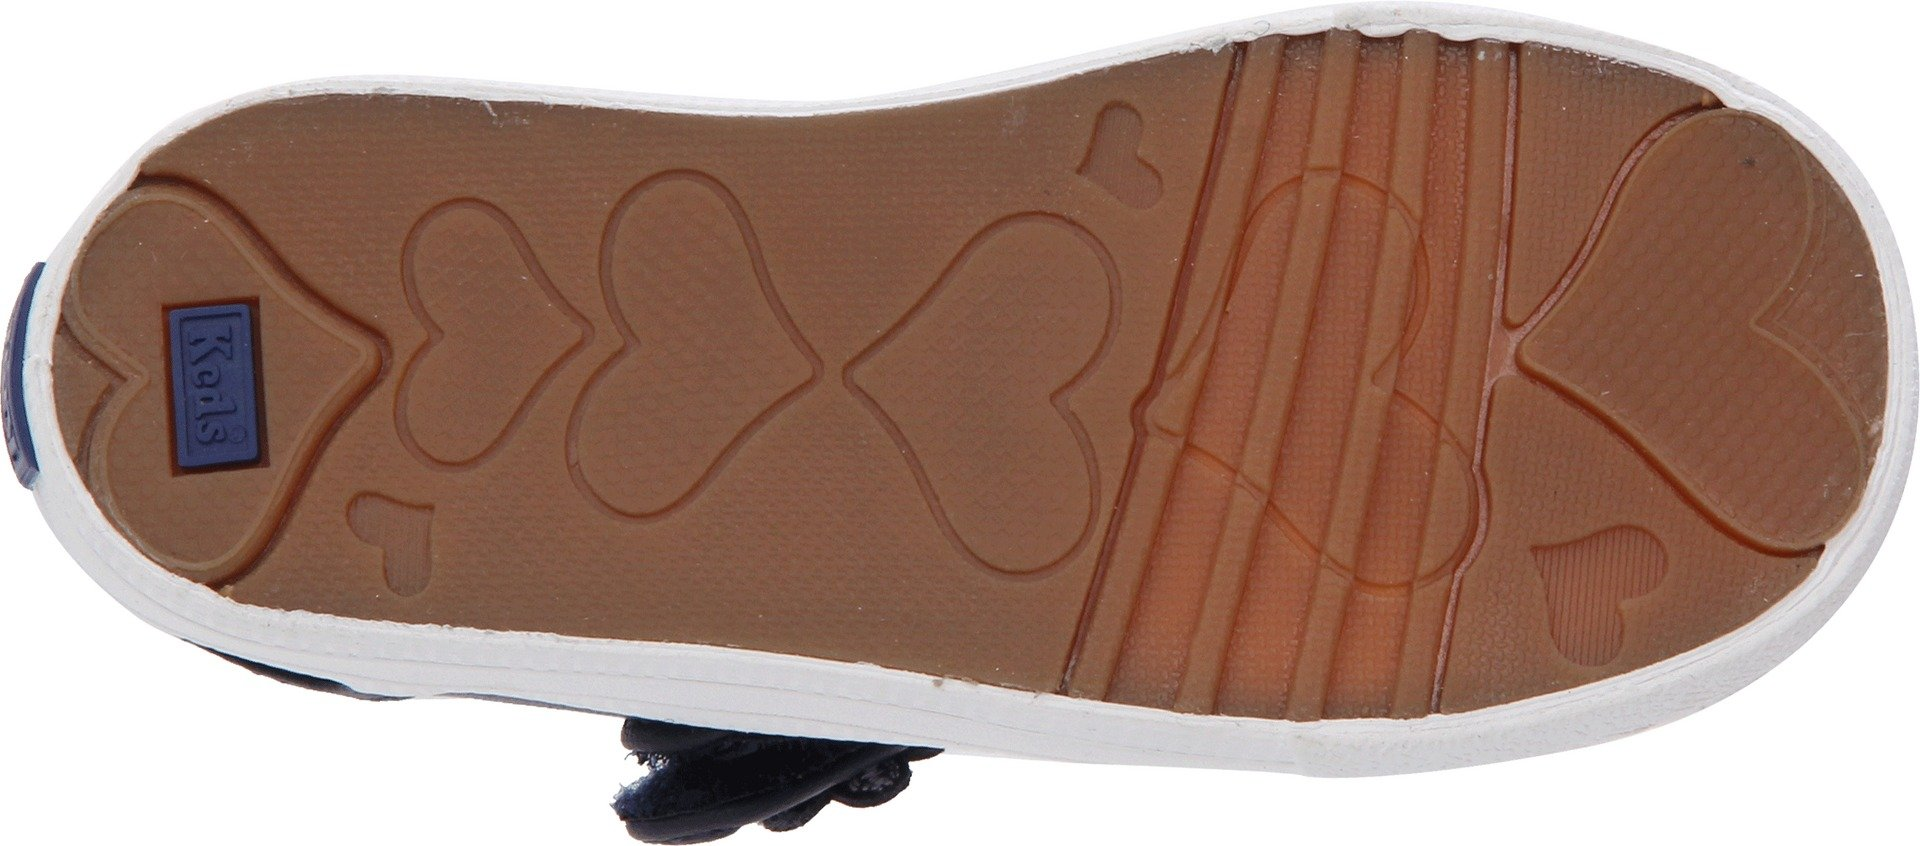 Keds unisex-child Ella Mary Jane Sneaker ,Navy,11 M US Little Kid by Keds (Image #3)